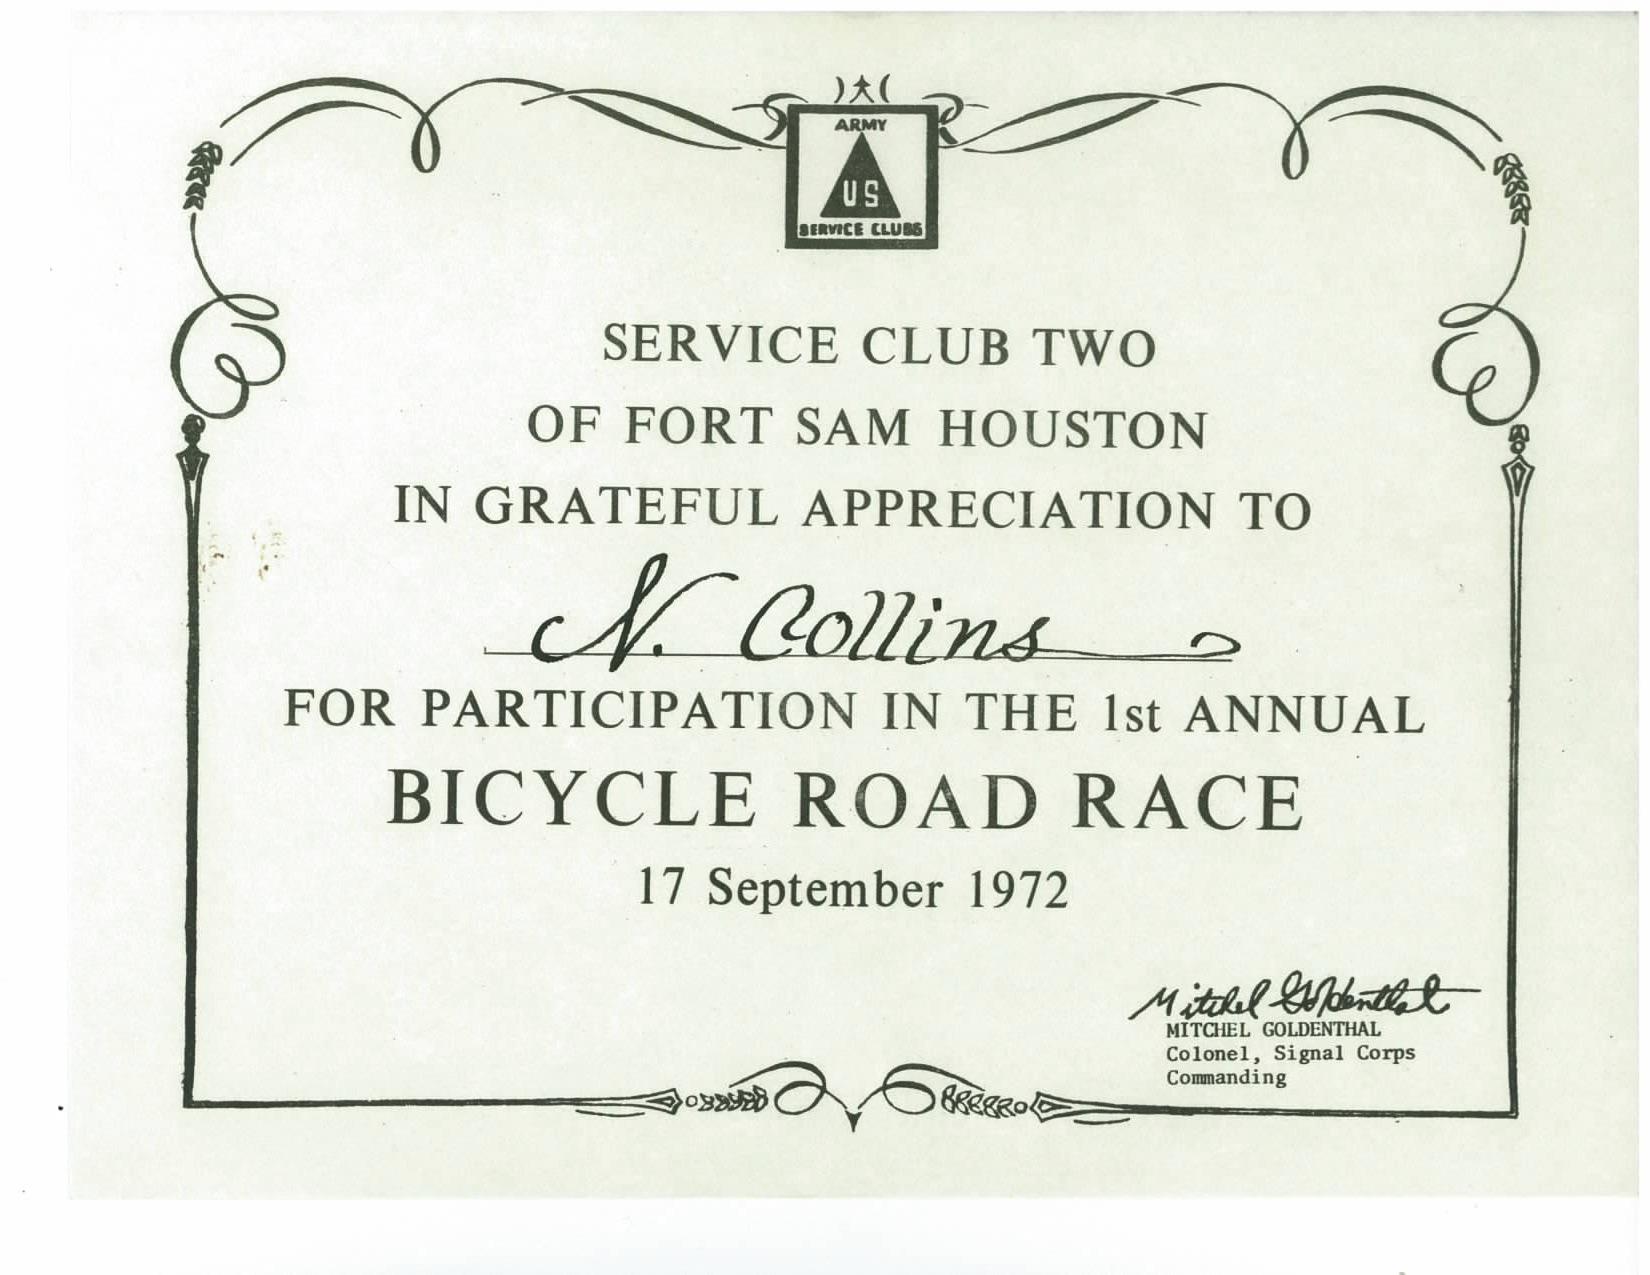 Neal Collins Ft Sam Bike Road Race Cert 1972.jpg